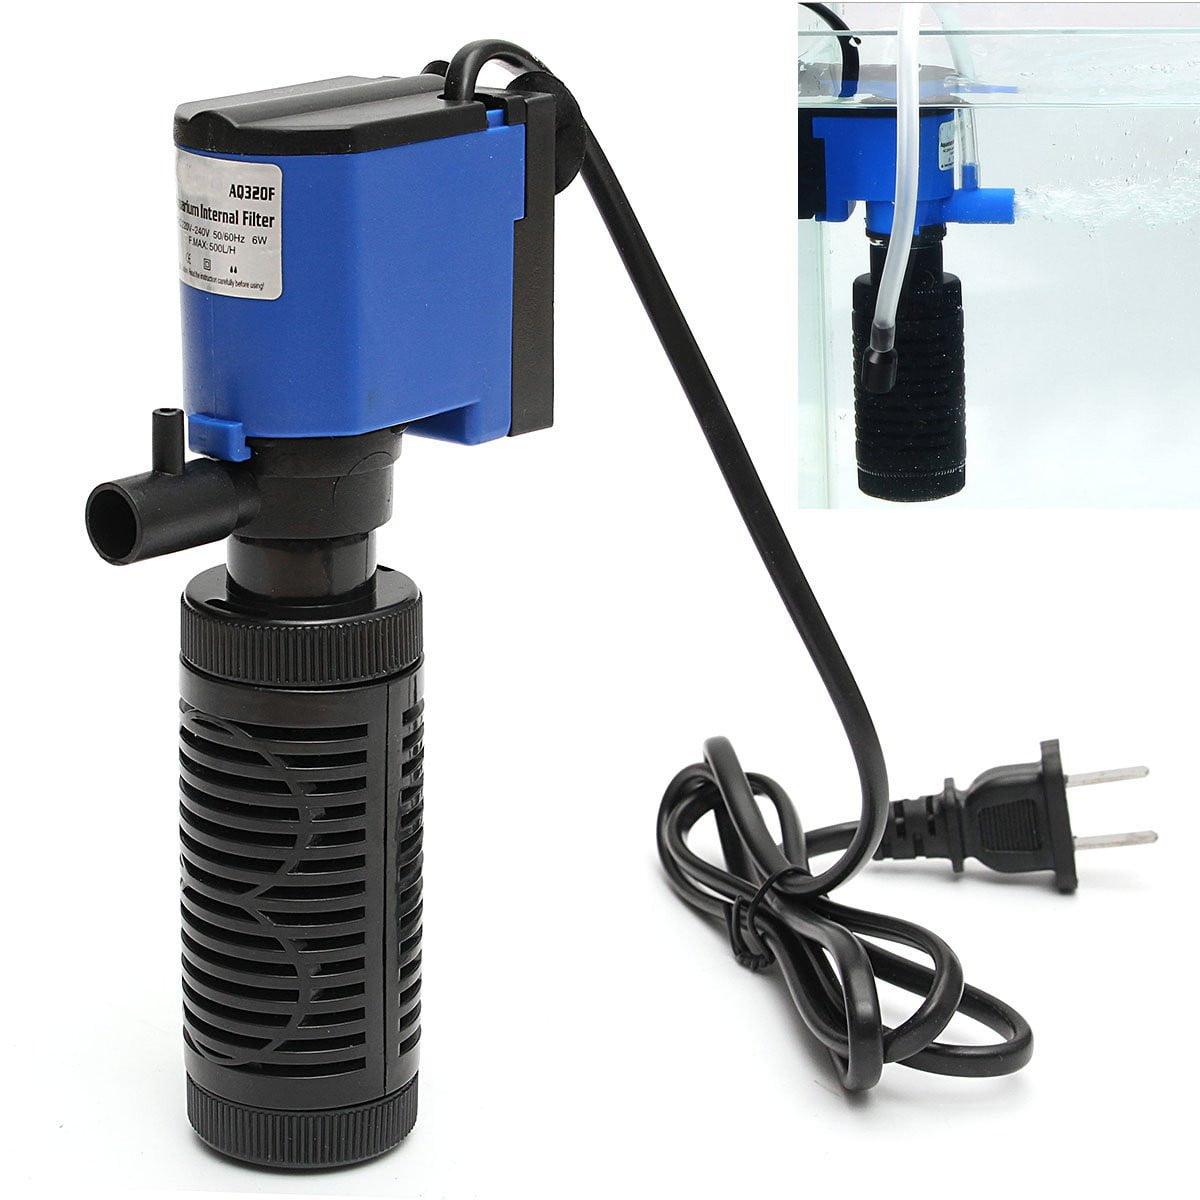 Meigar 6W 1000L/H 220V Submersible Water Internal Filter Aquarium Fish Tank Pump Spray